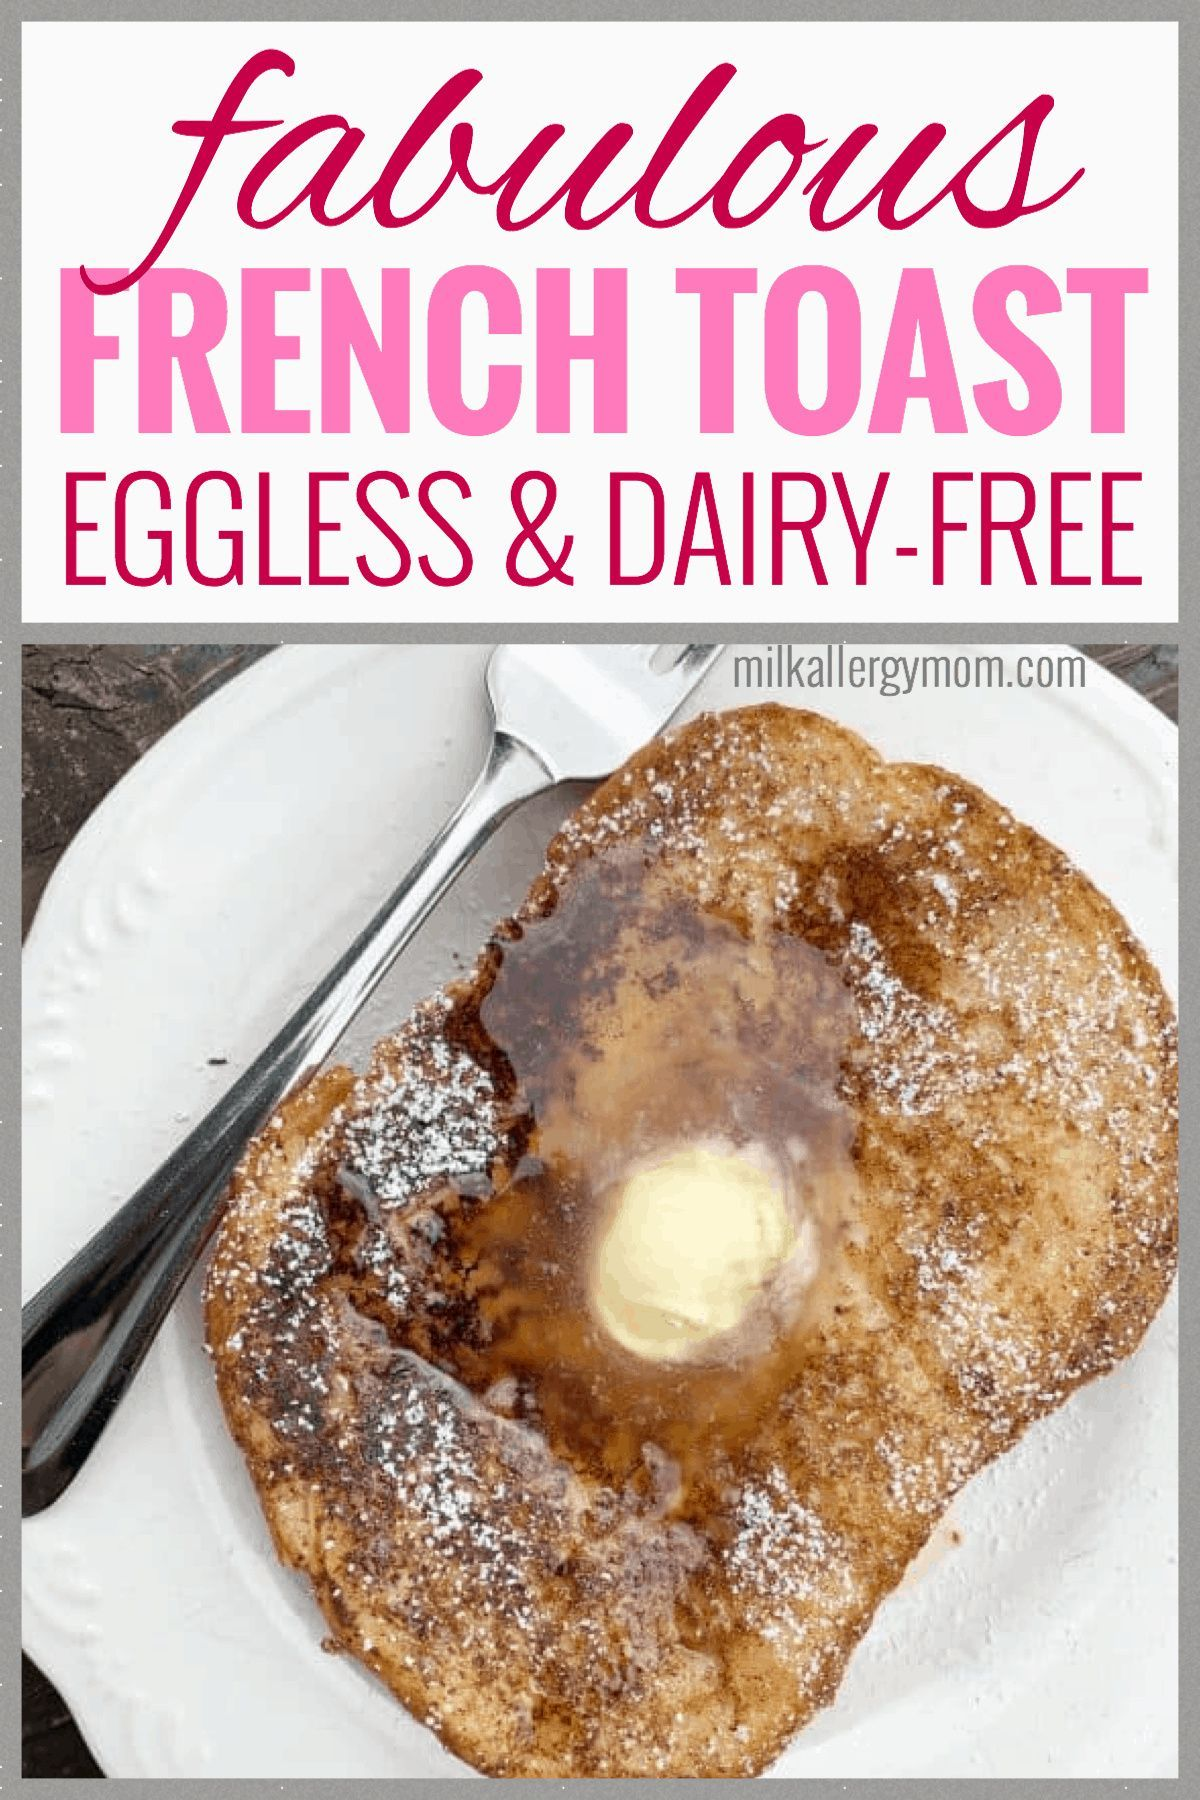 Eggless french toast dairyfree milk allergy mom video